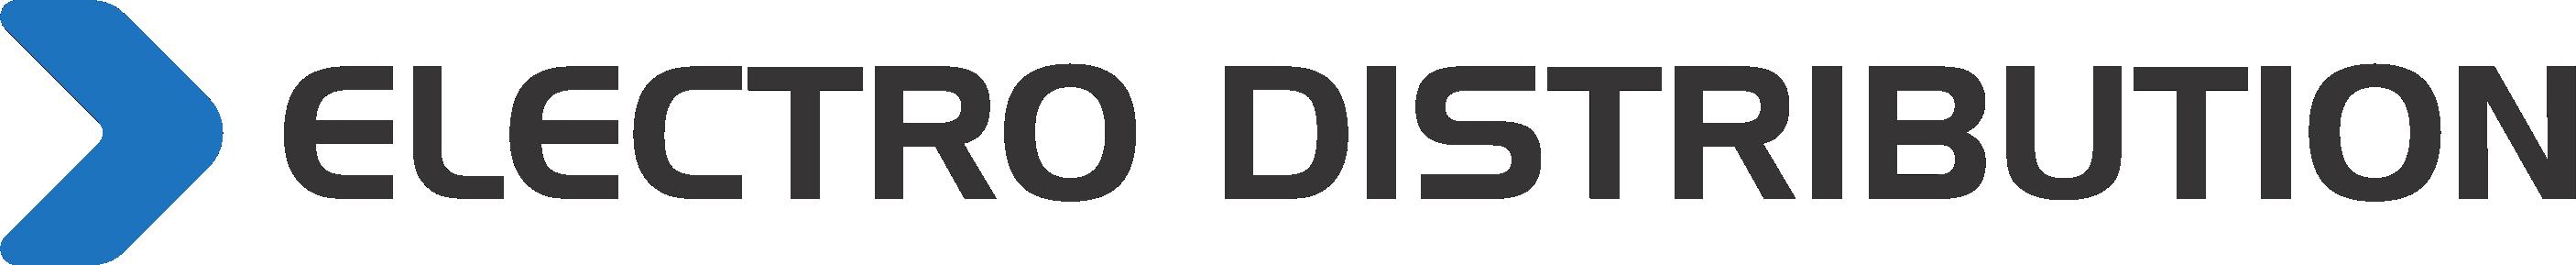 Electro Distribution